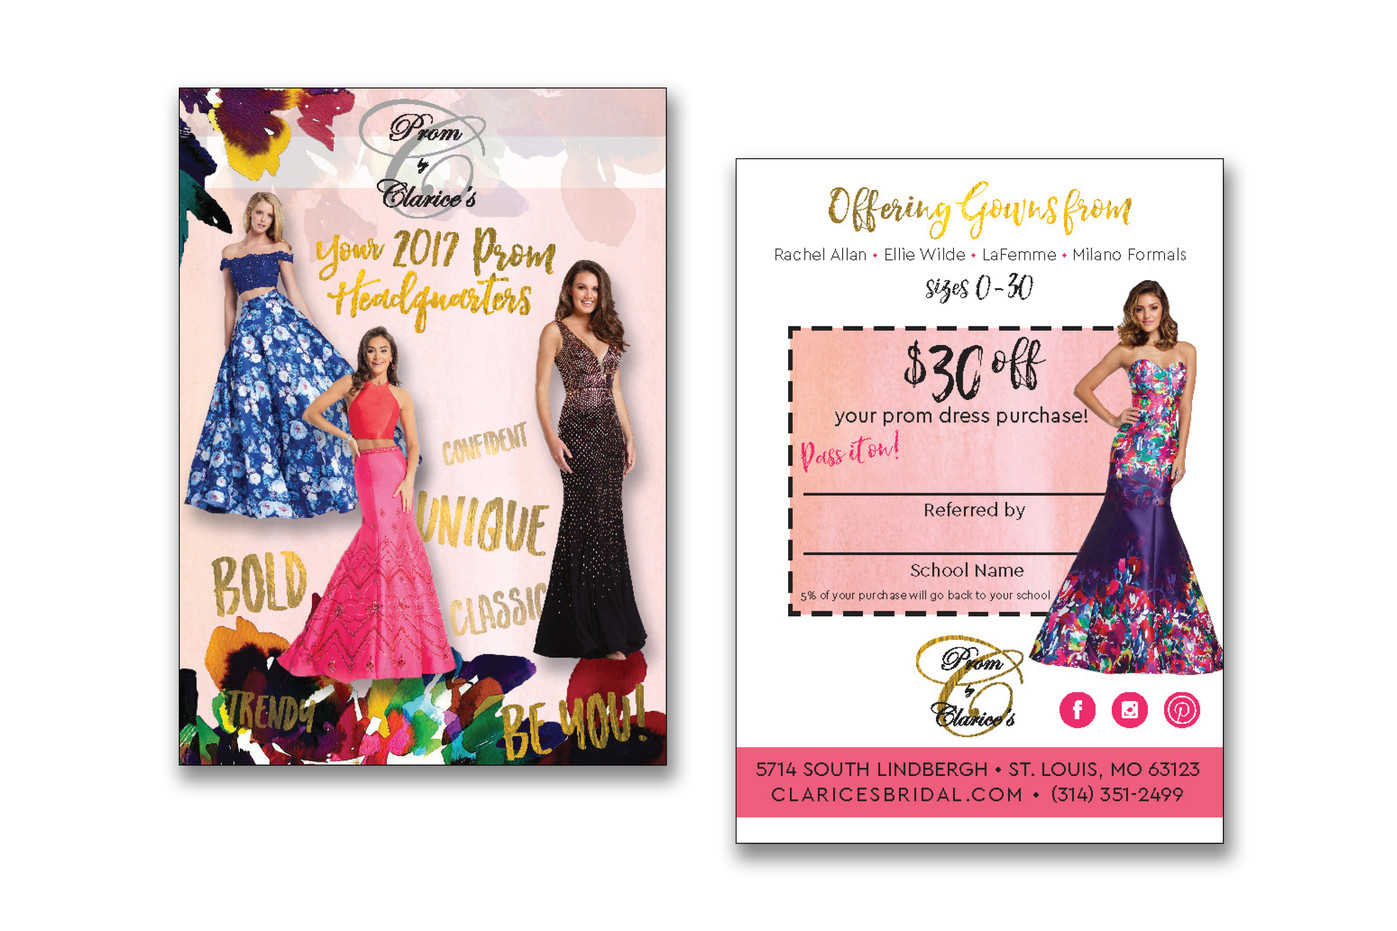 Prom Dress Postcard Handout